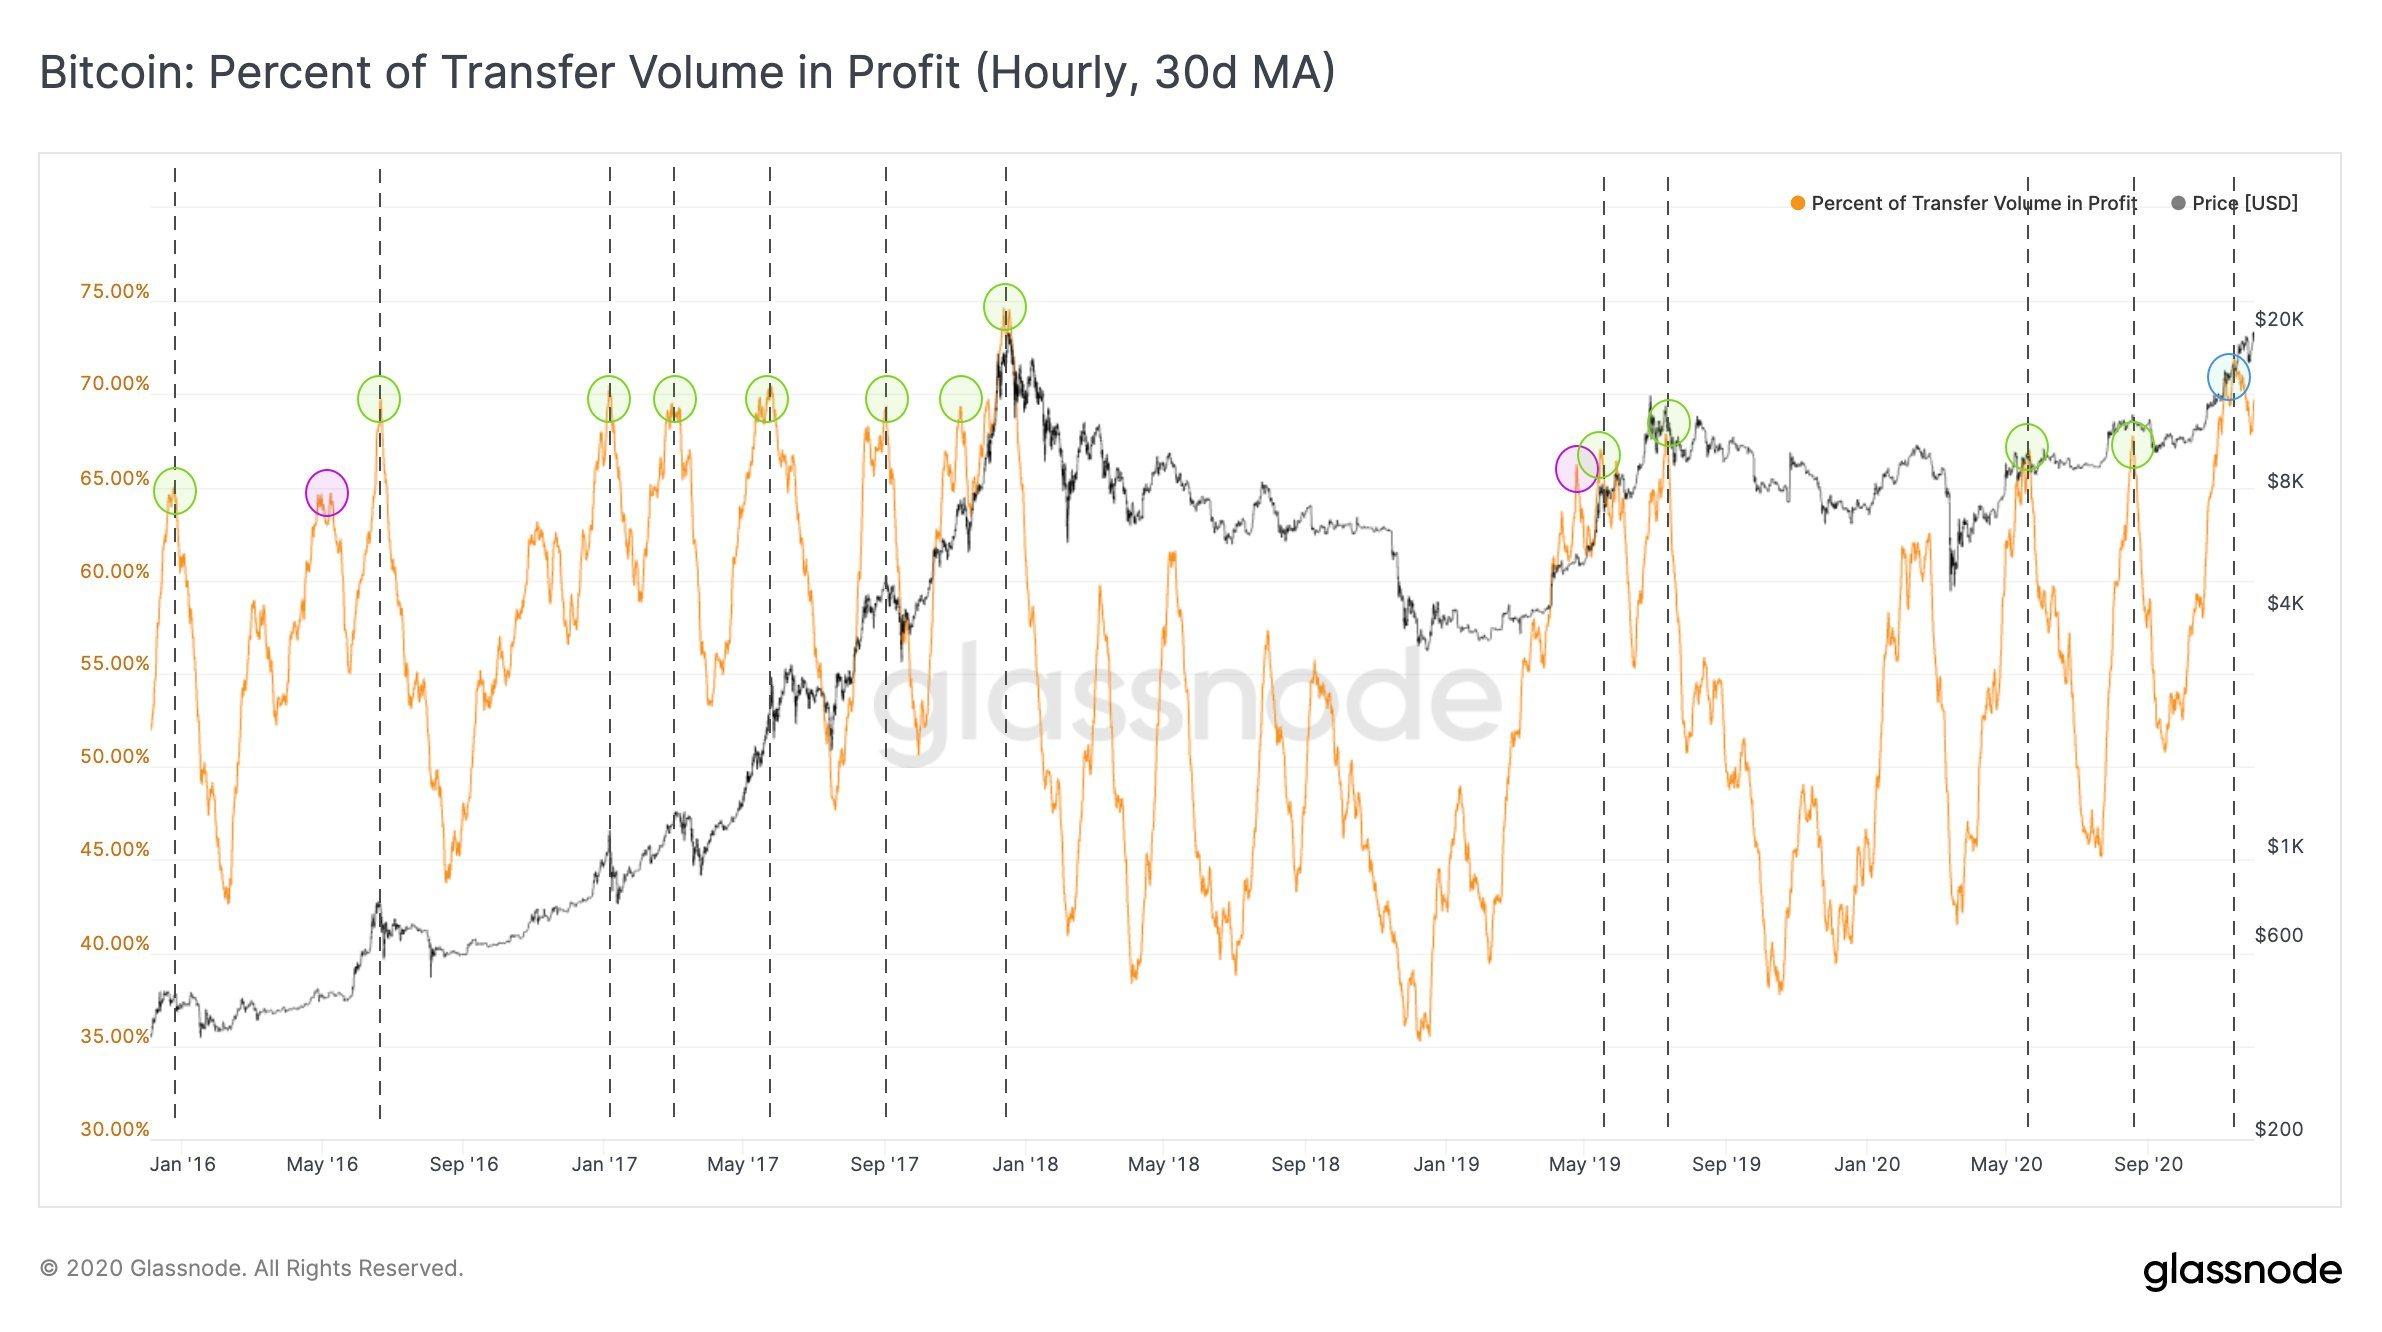 Percent of Transfer Volume in Profit